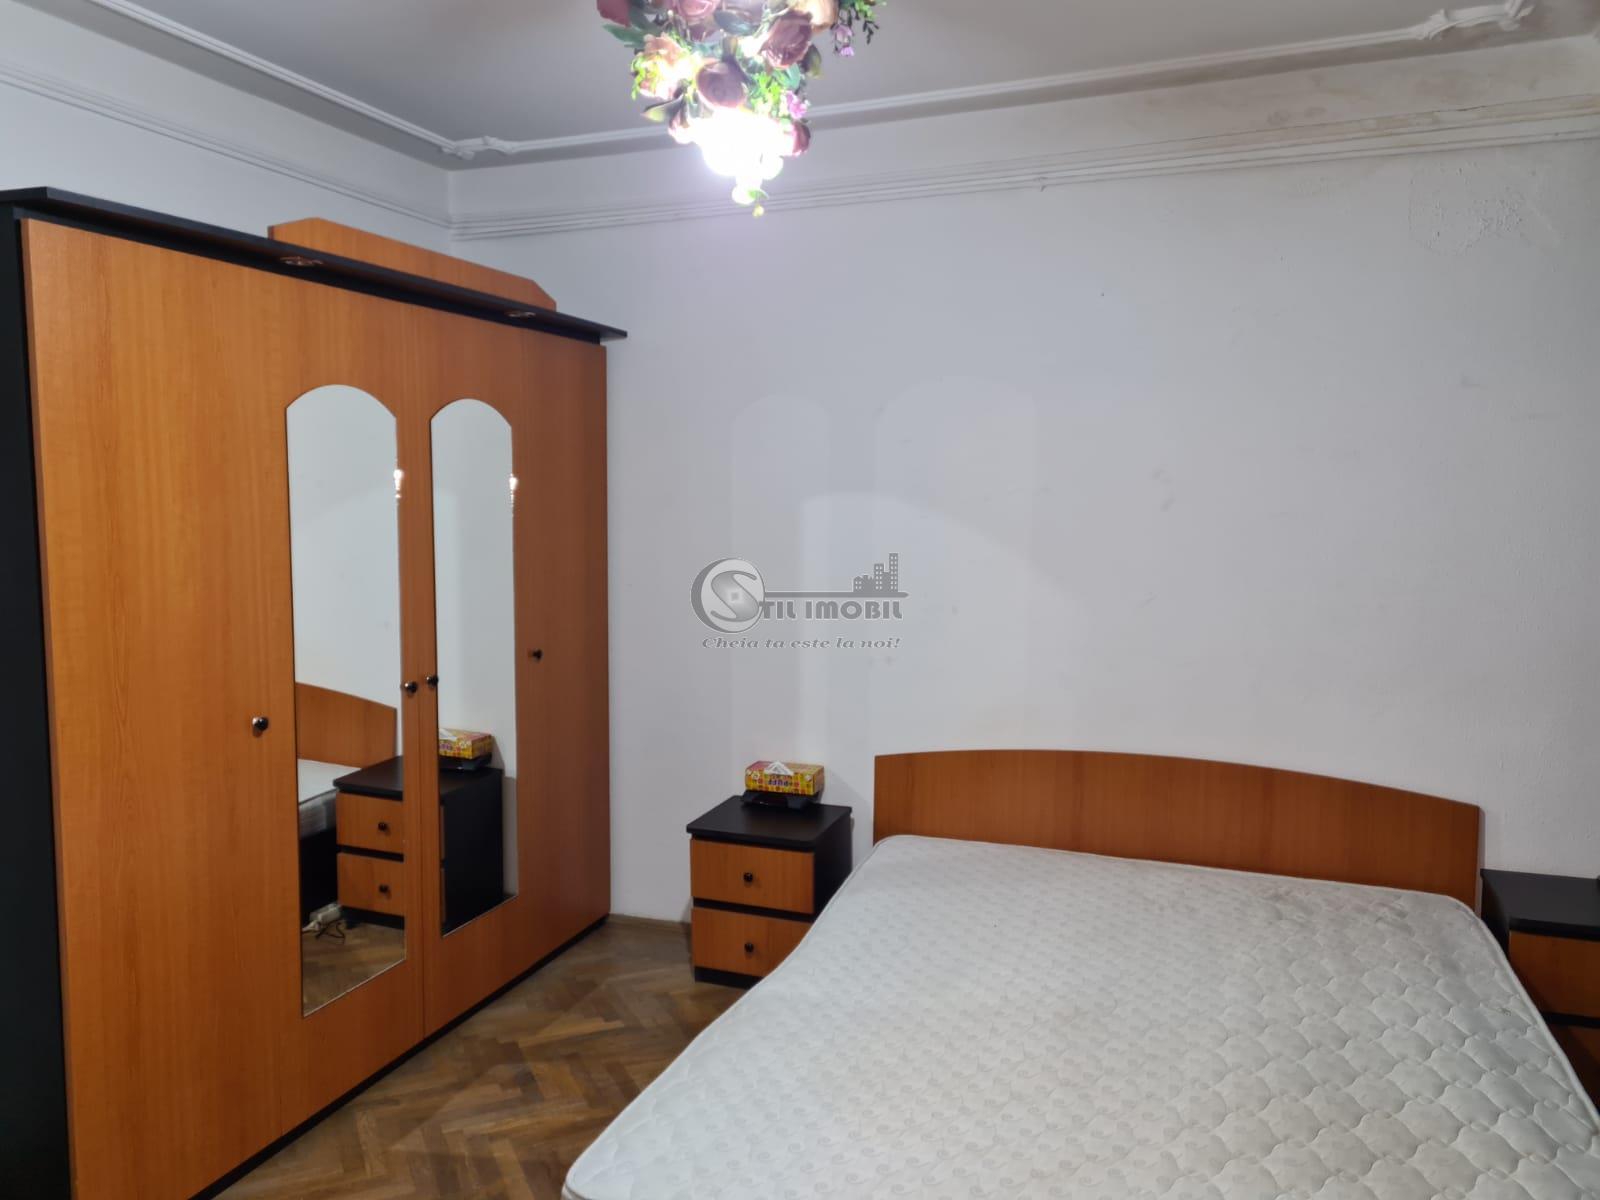 Apartament 2 camere - Podul ros - Cantemir